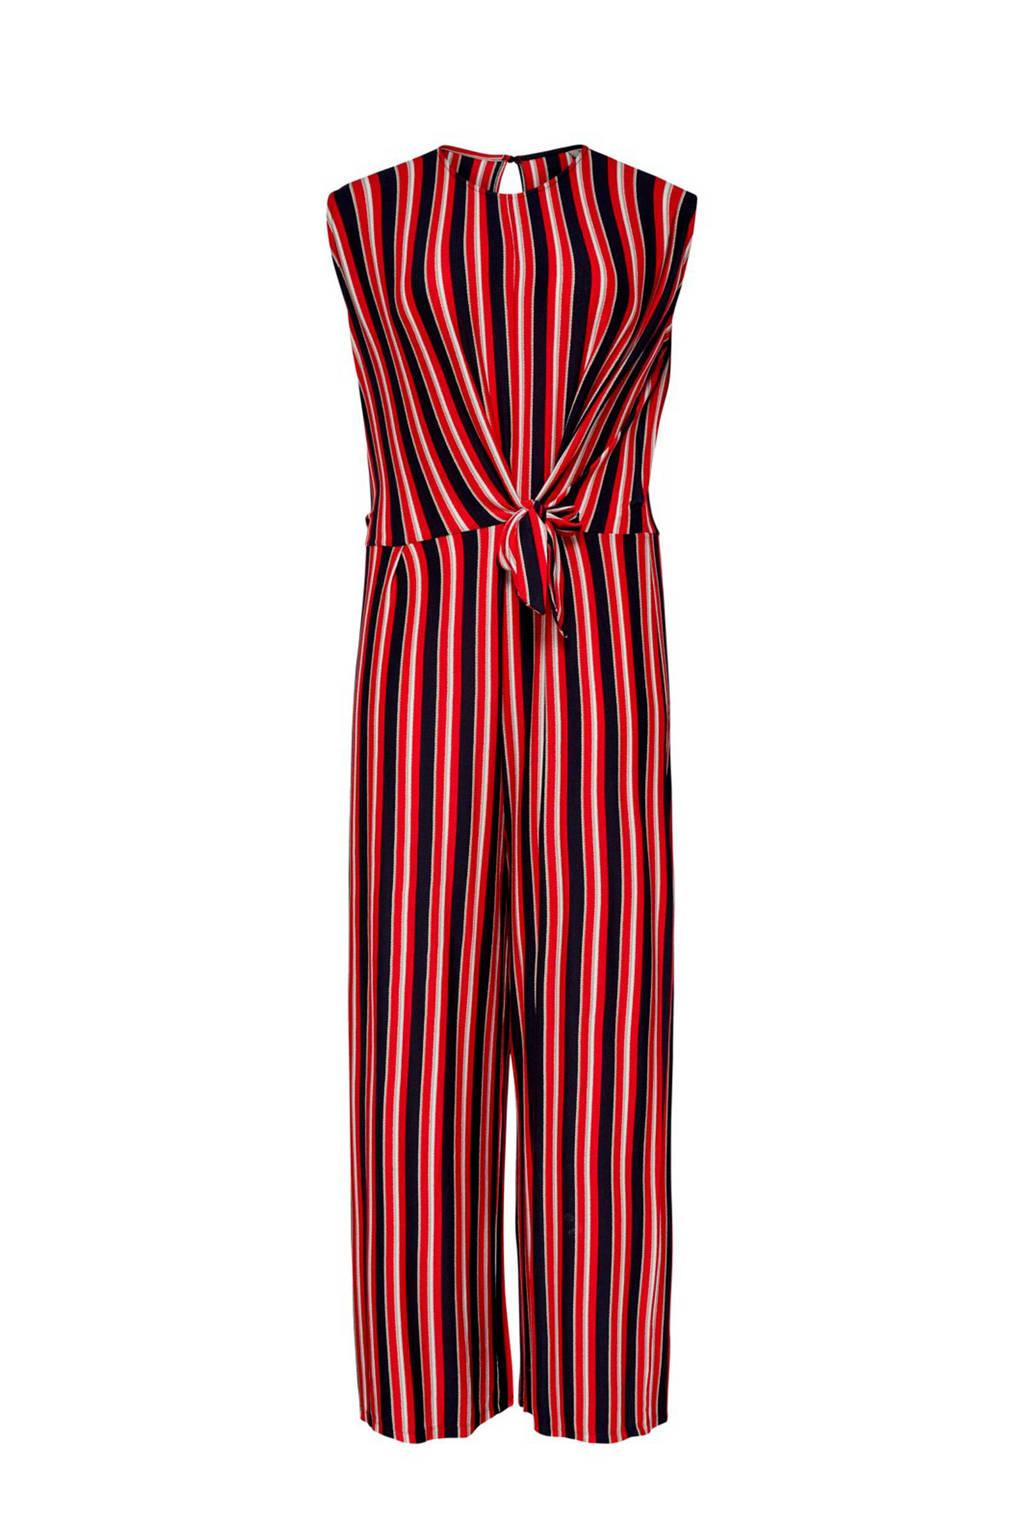 ONLY carmakoma gestreepte jumpsuit rood, Rood/zwart/wit